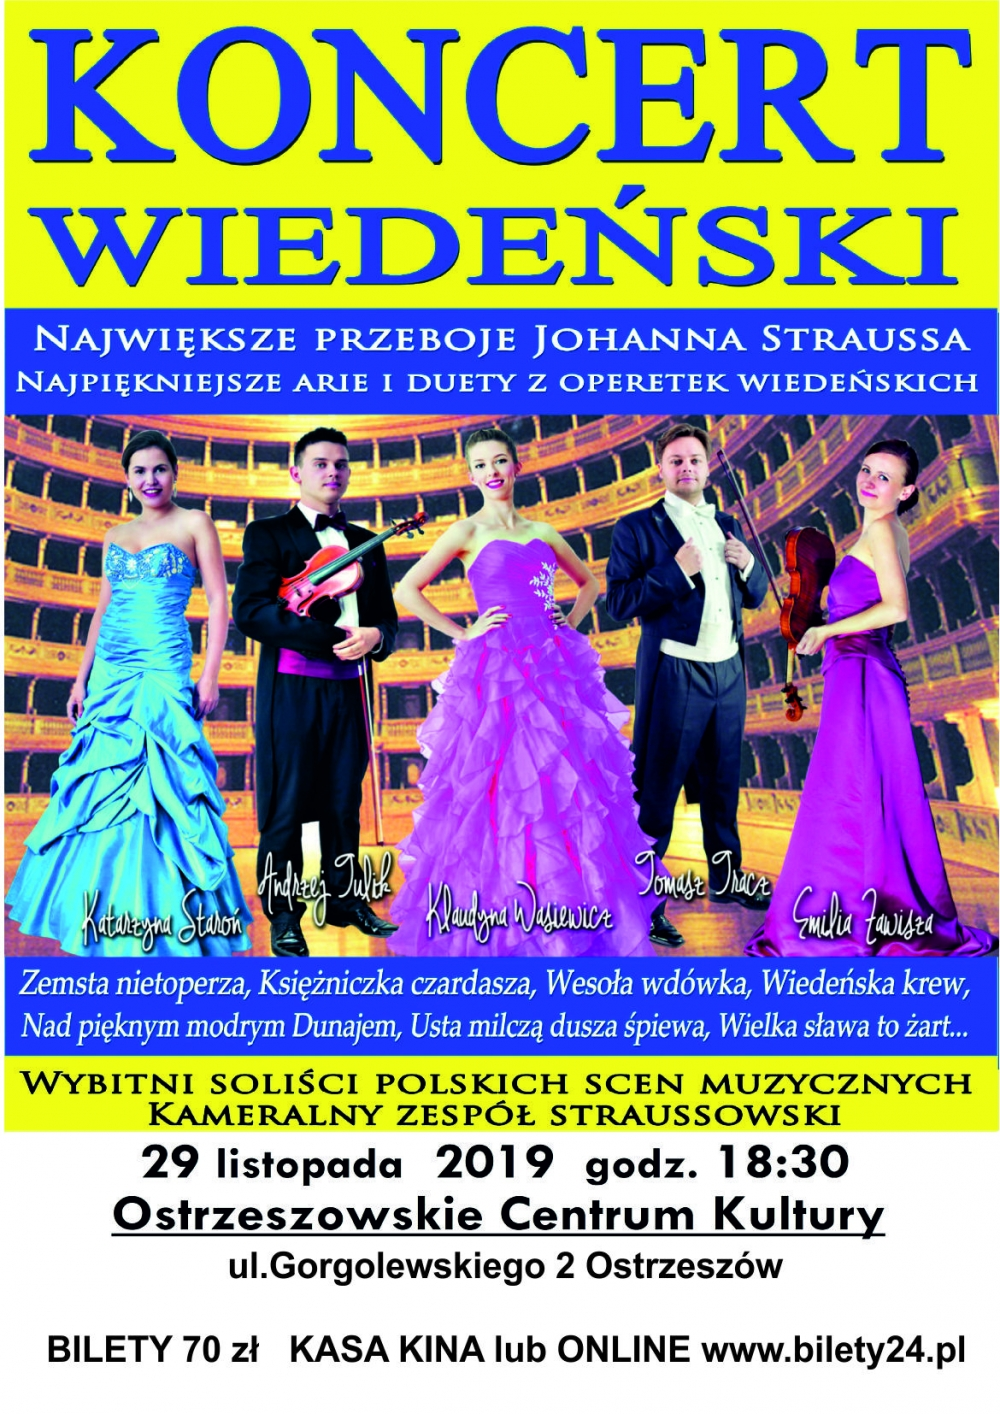 Koncert - Koncert Wiedeński Tomczyk Art